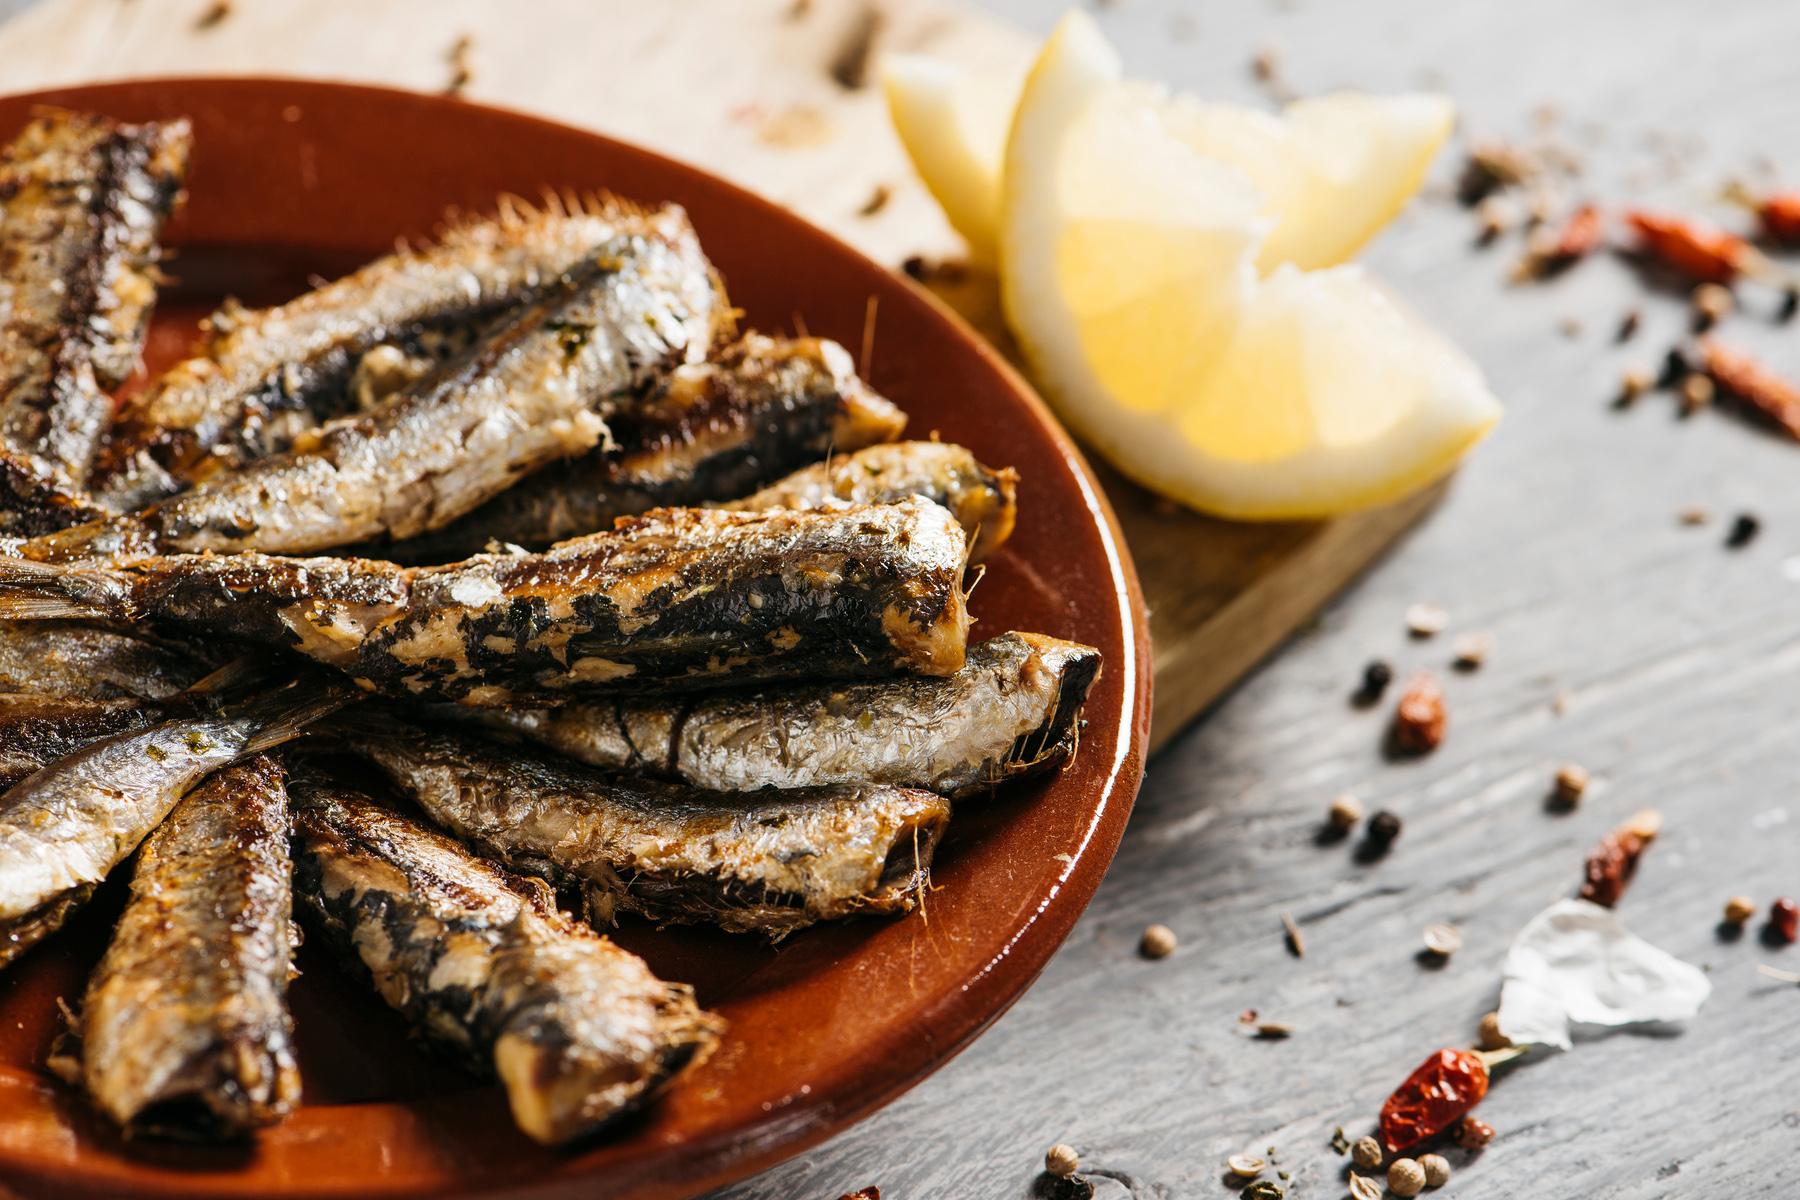 Spanish grilled sardines